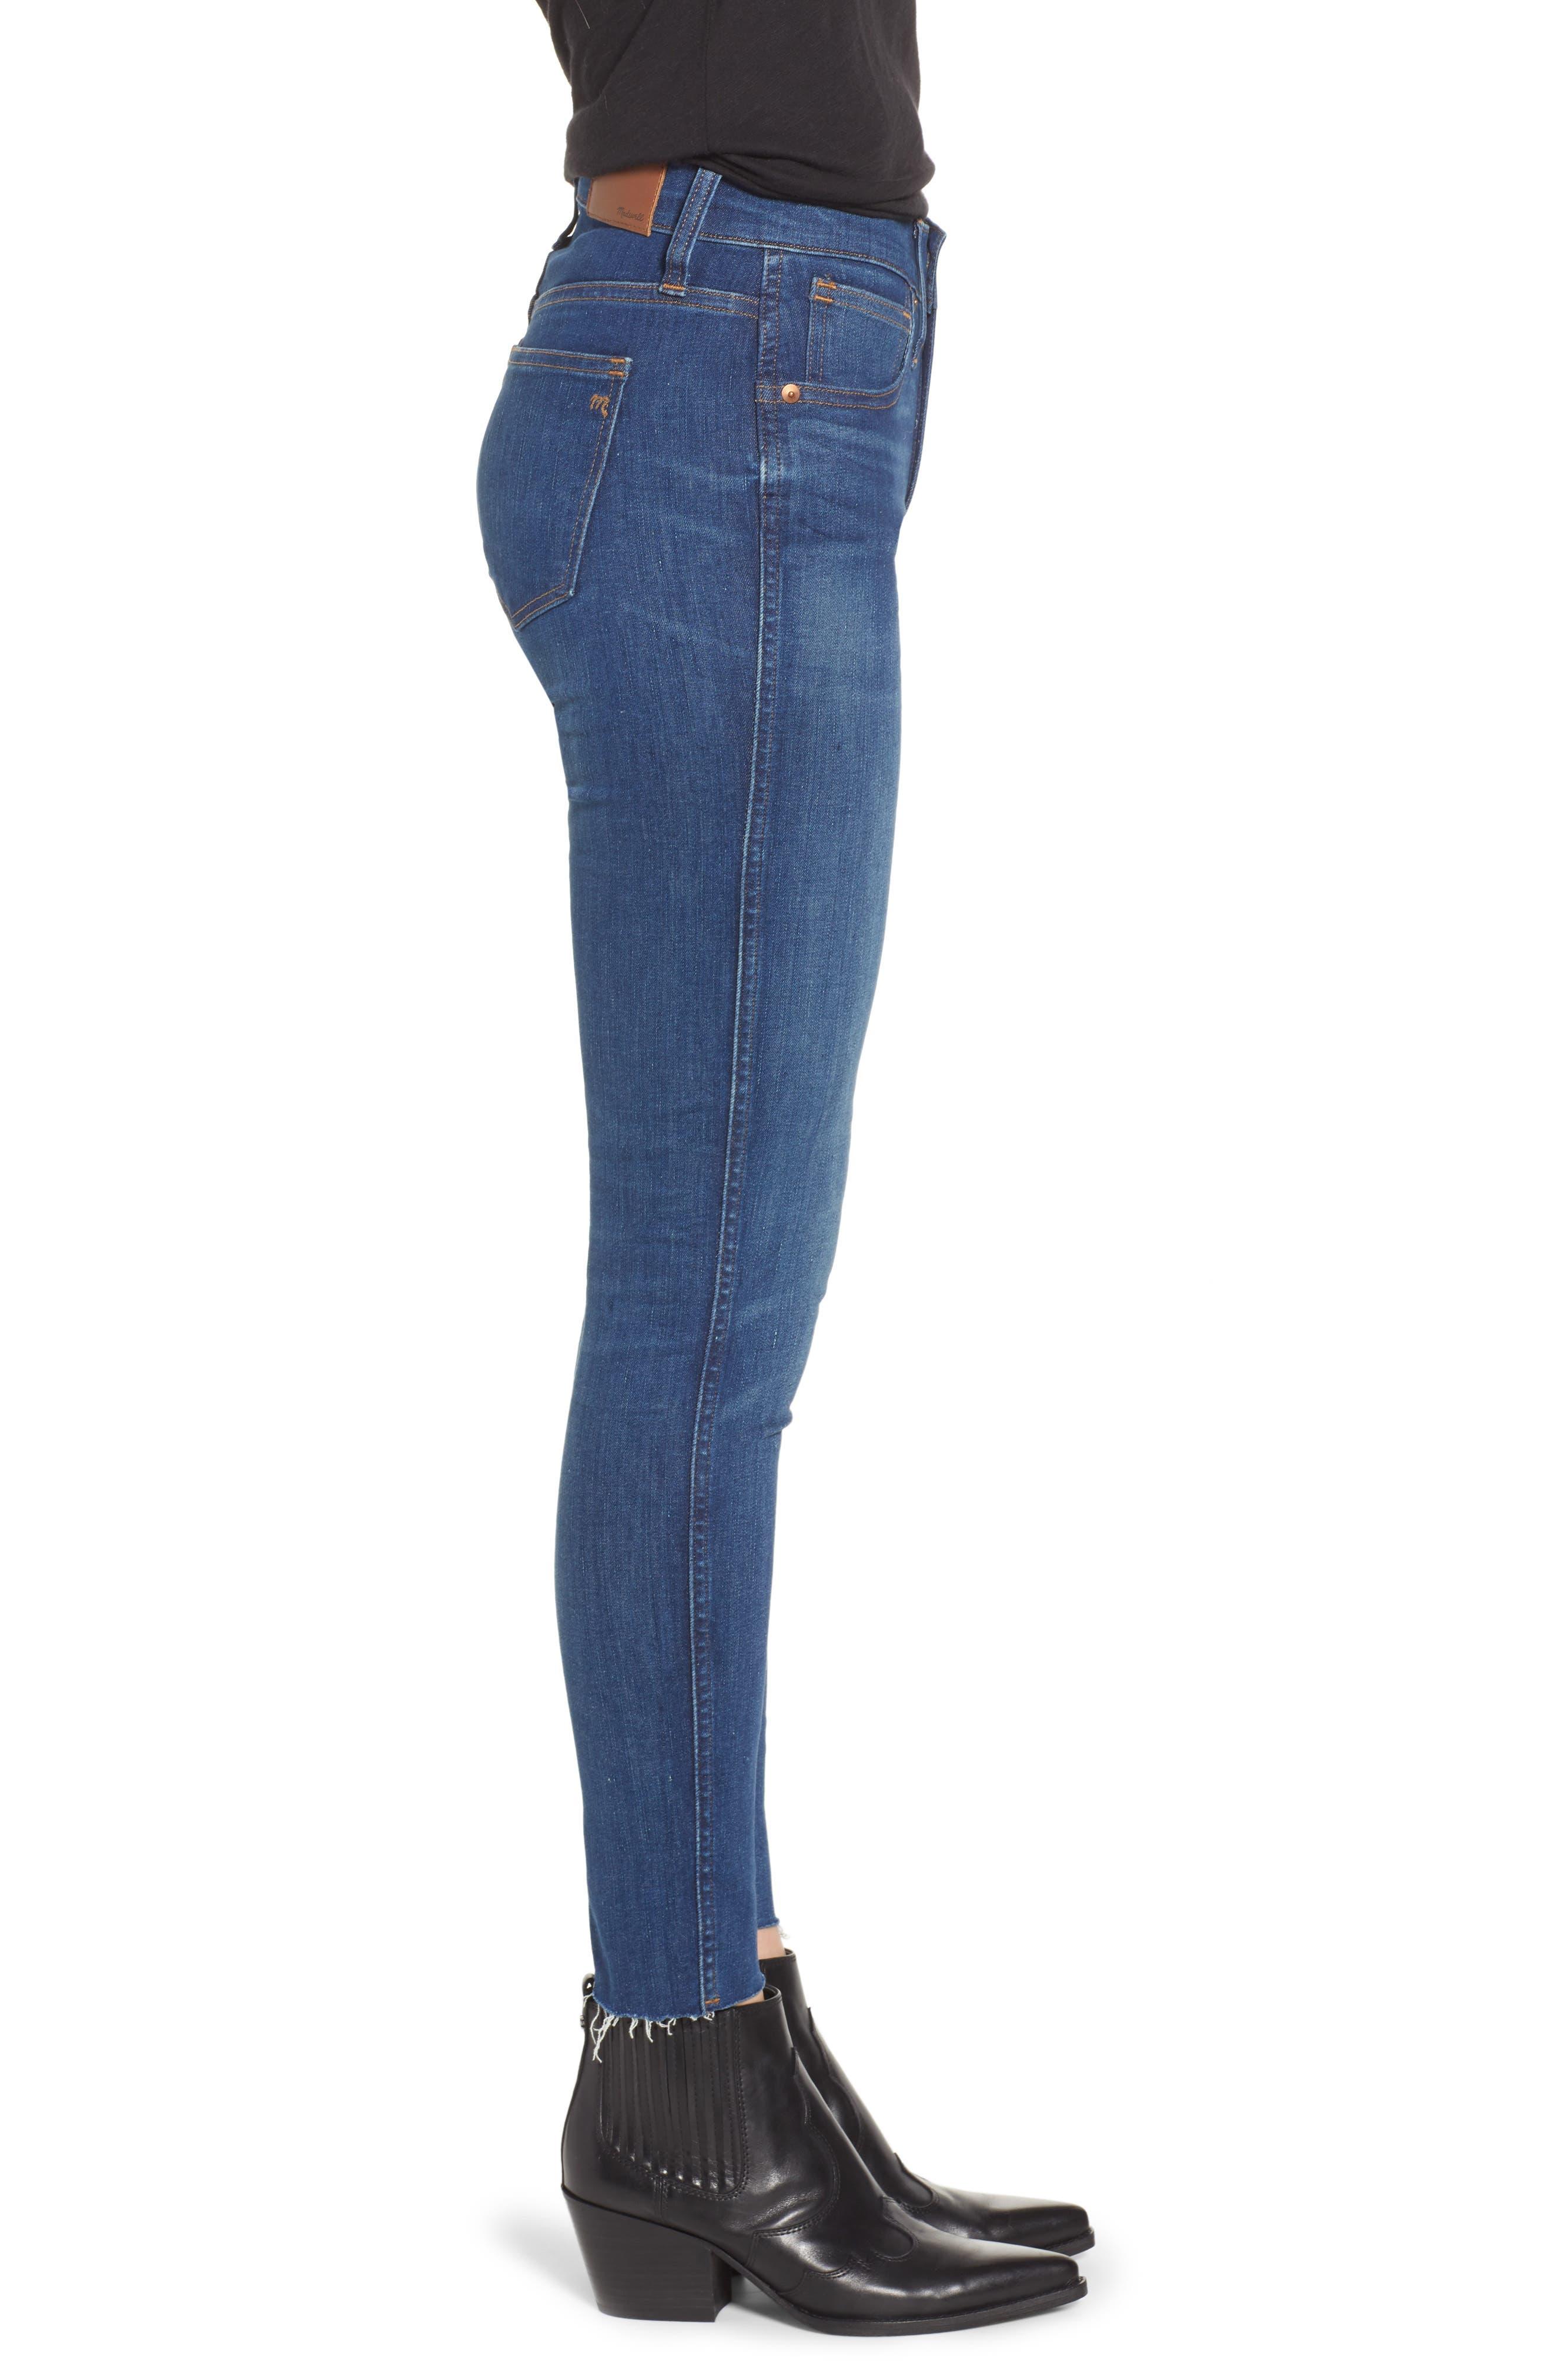 MADEWELL,                             9-Inch Skinny Jeans Raw Hem Edition,                             Alternate thumbnail 4, color,                             PALOMA